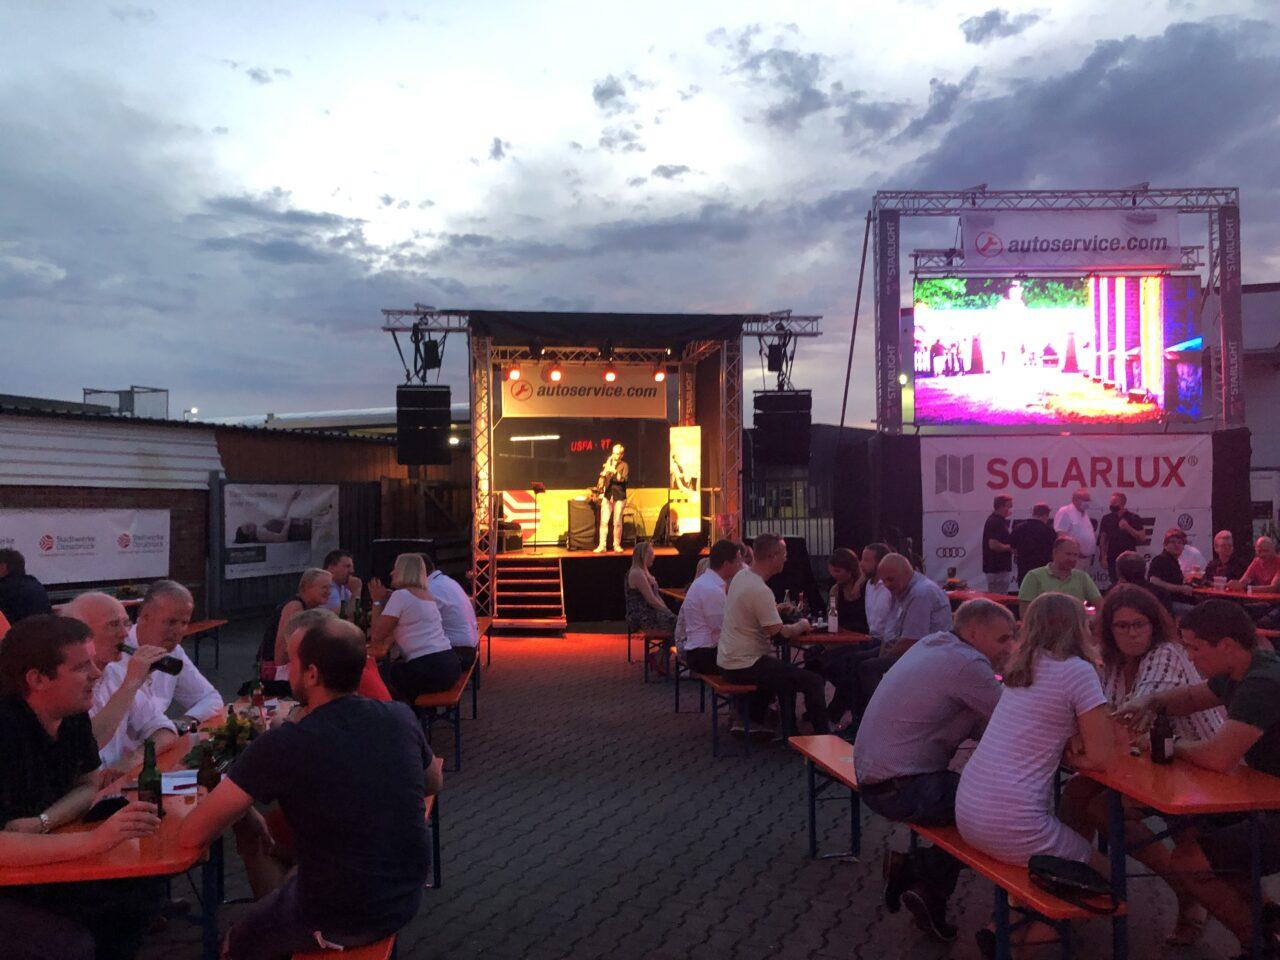 Sponsorenabend mit Mister SAX in Osnabrück